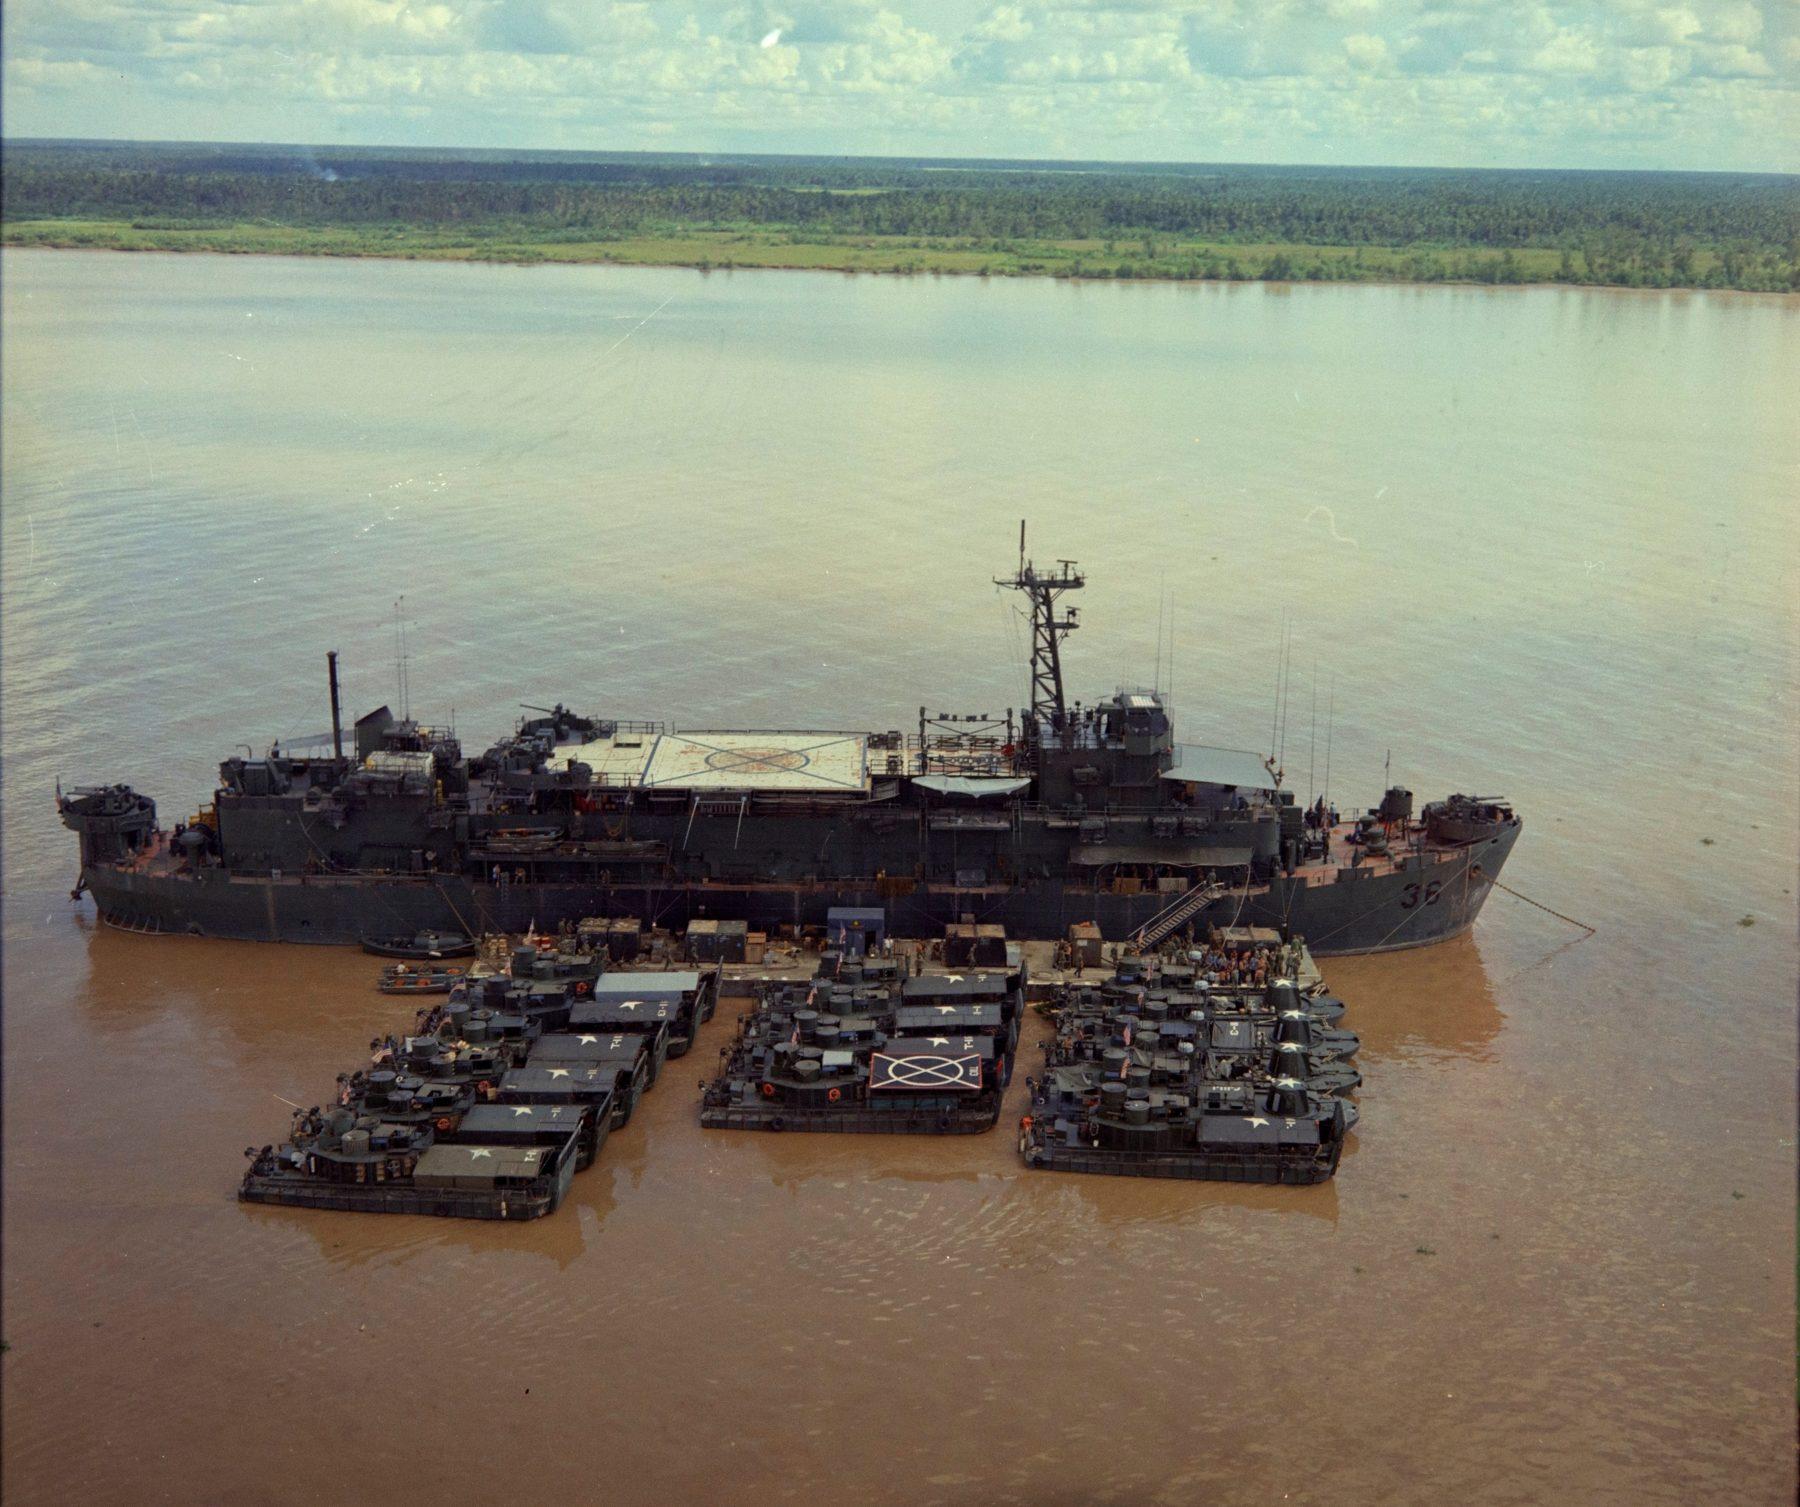 NARA USS Benewah and smaller craft on My Tho River circa 1967